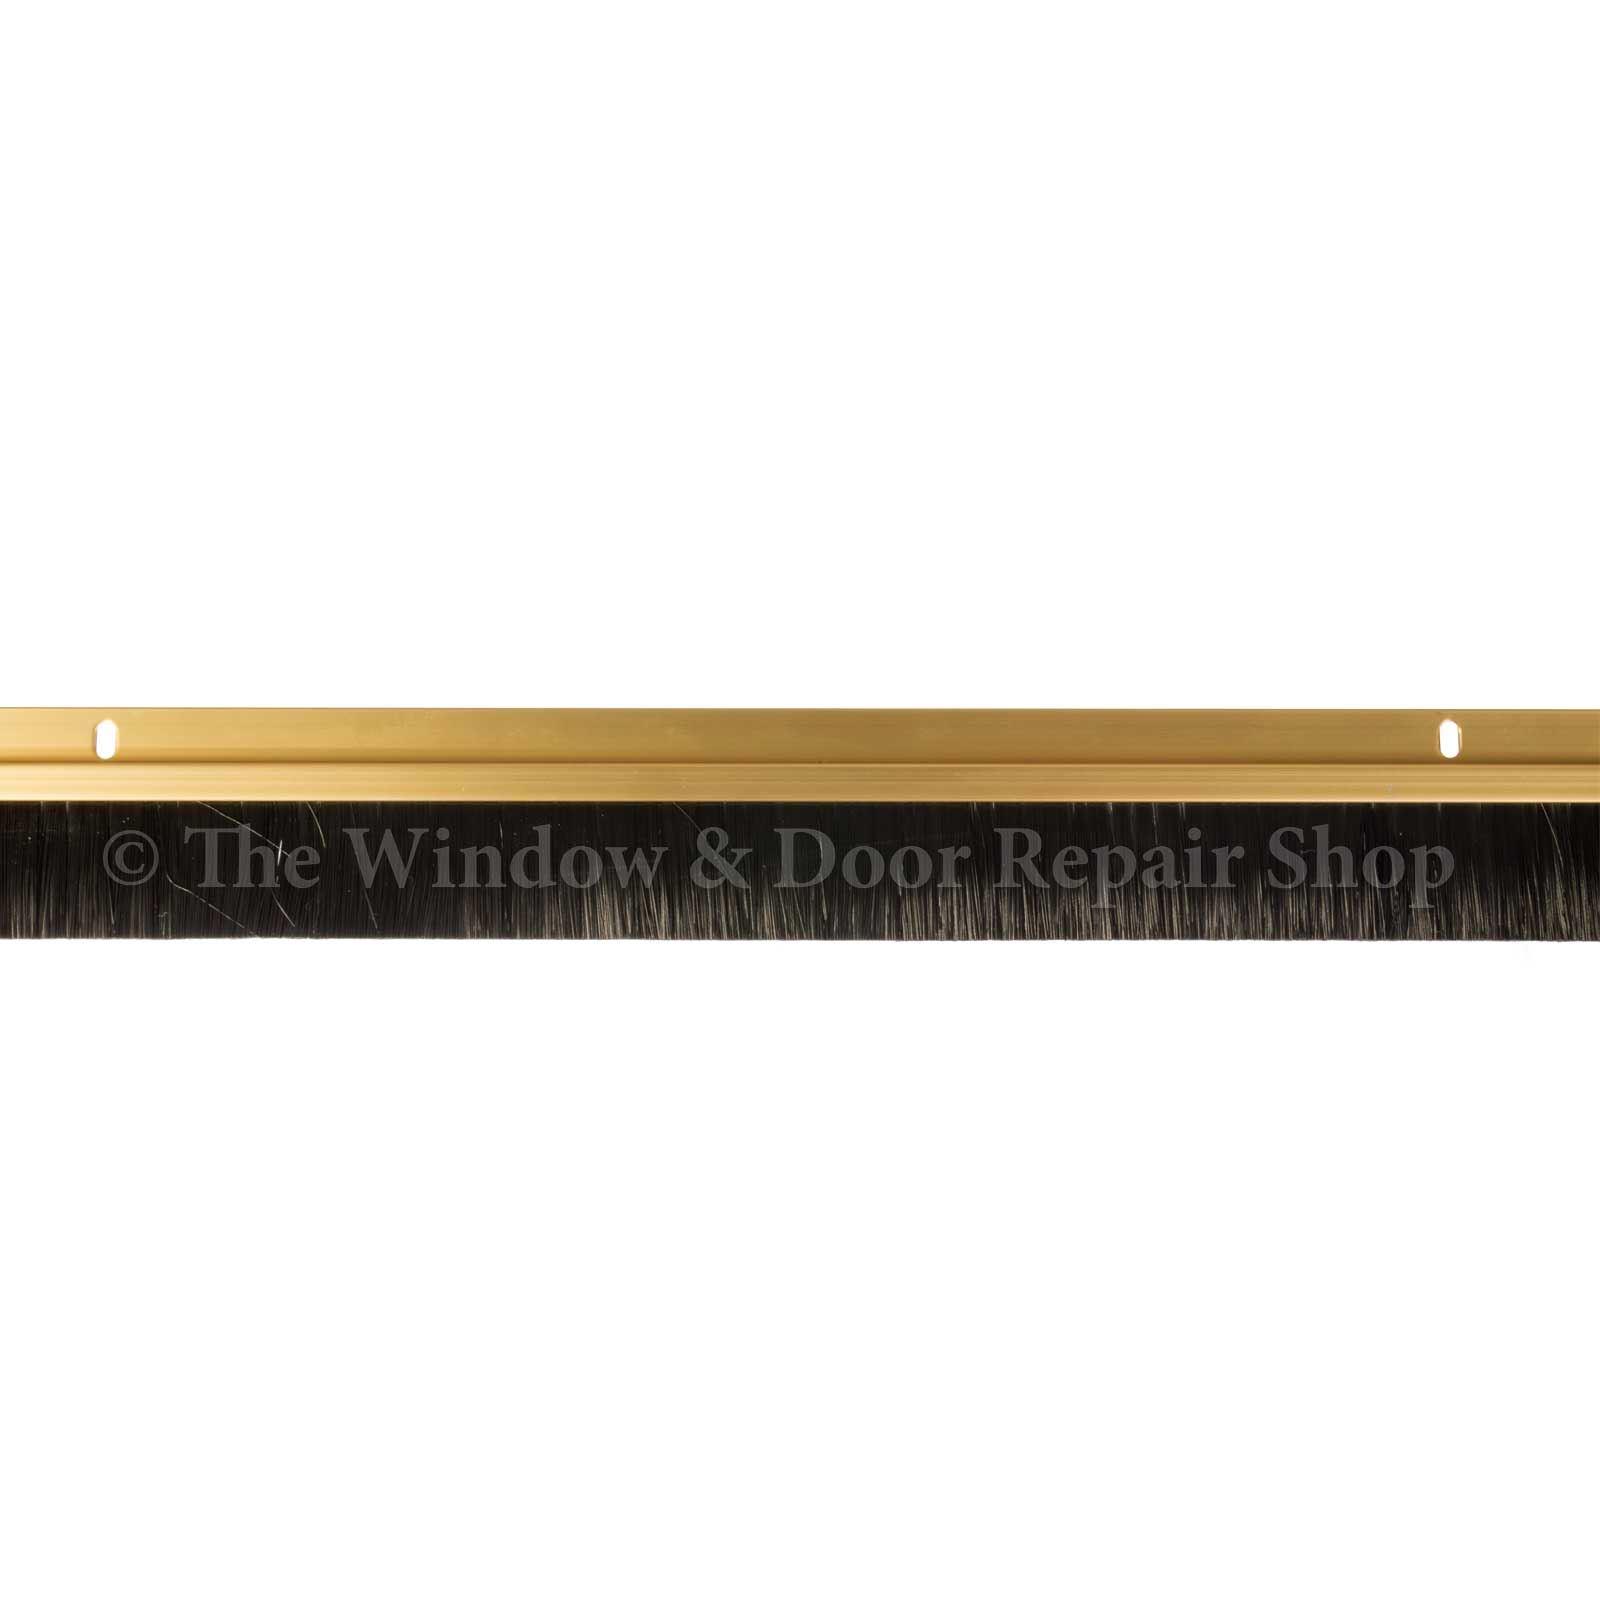 Draught Excluder Quality Aluminium Metal Bottom Door Brush